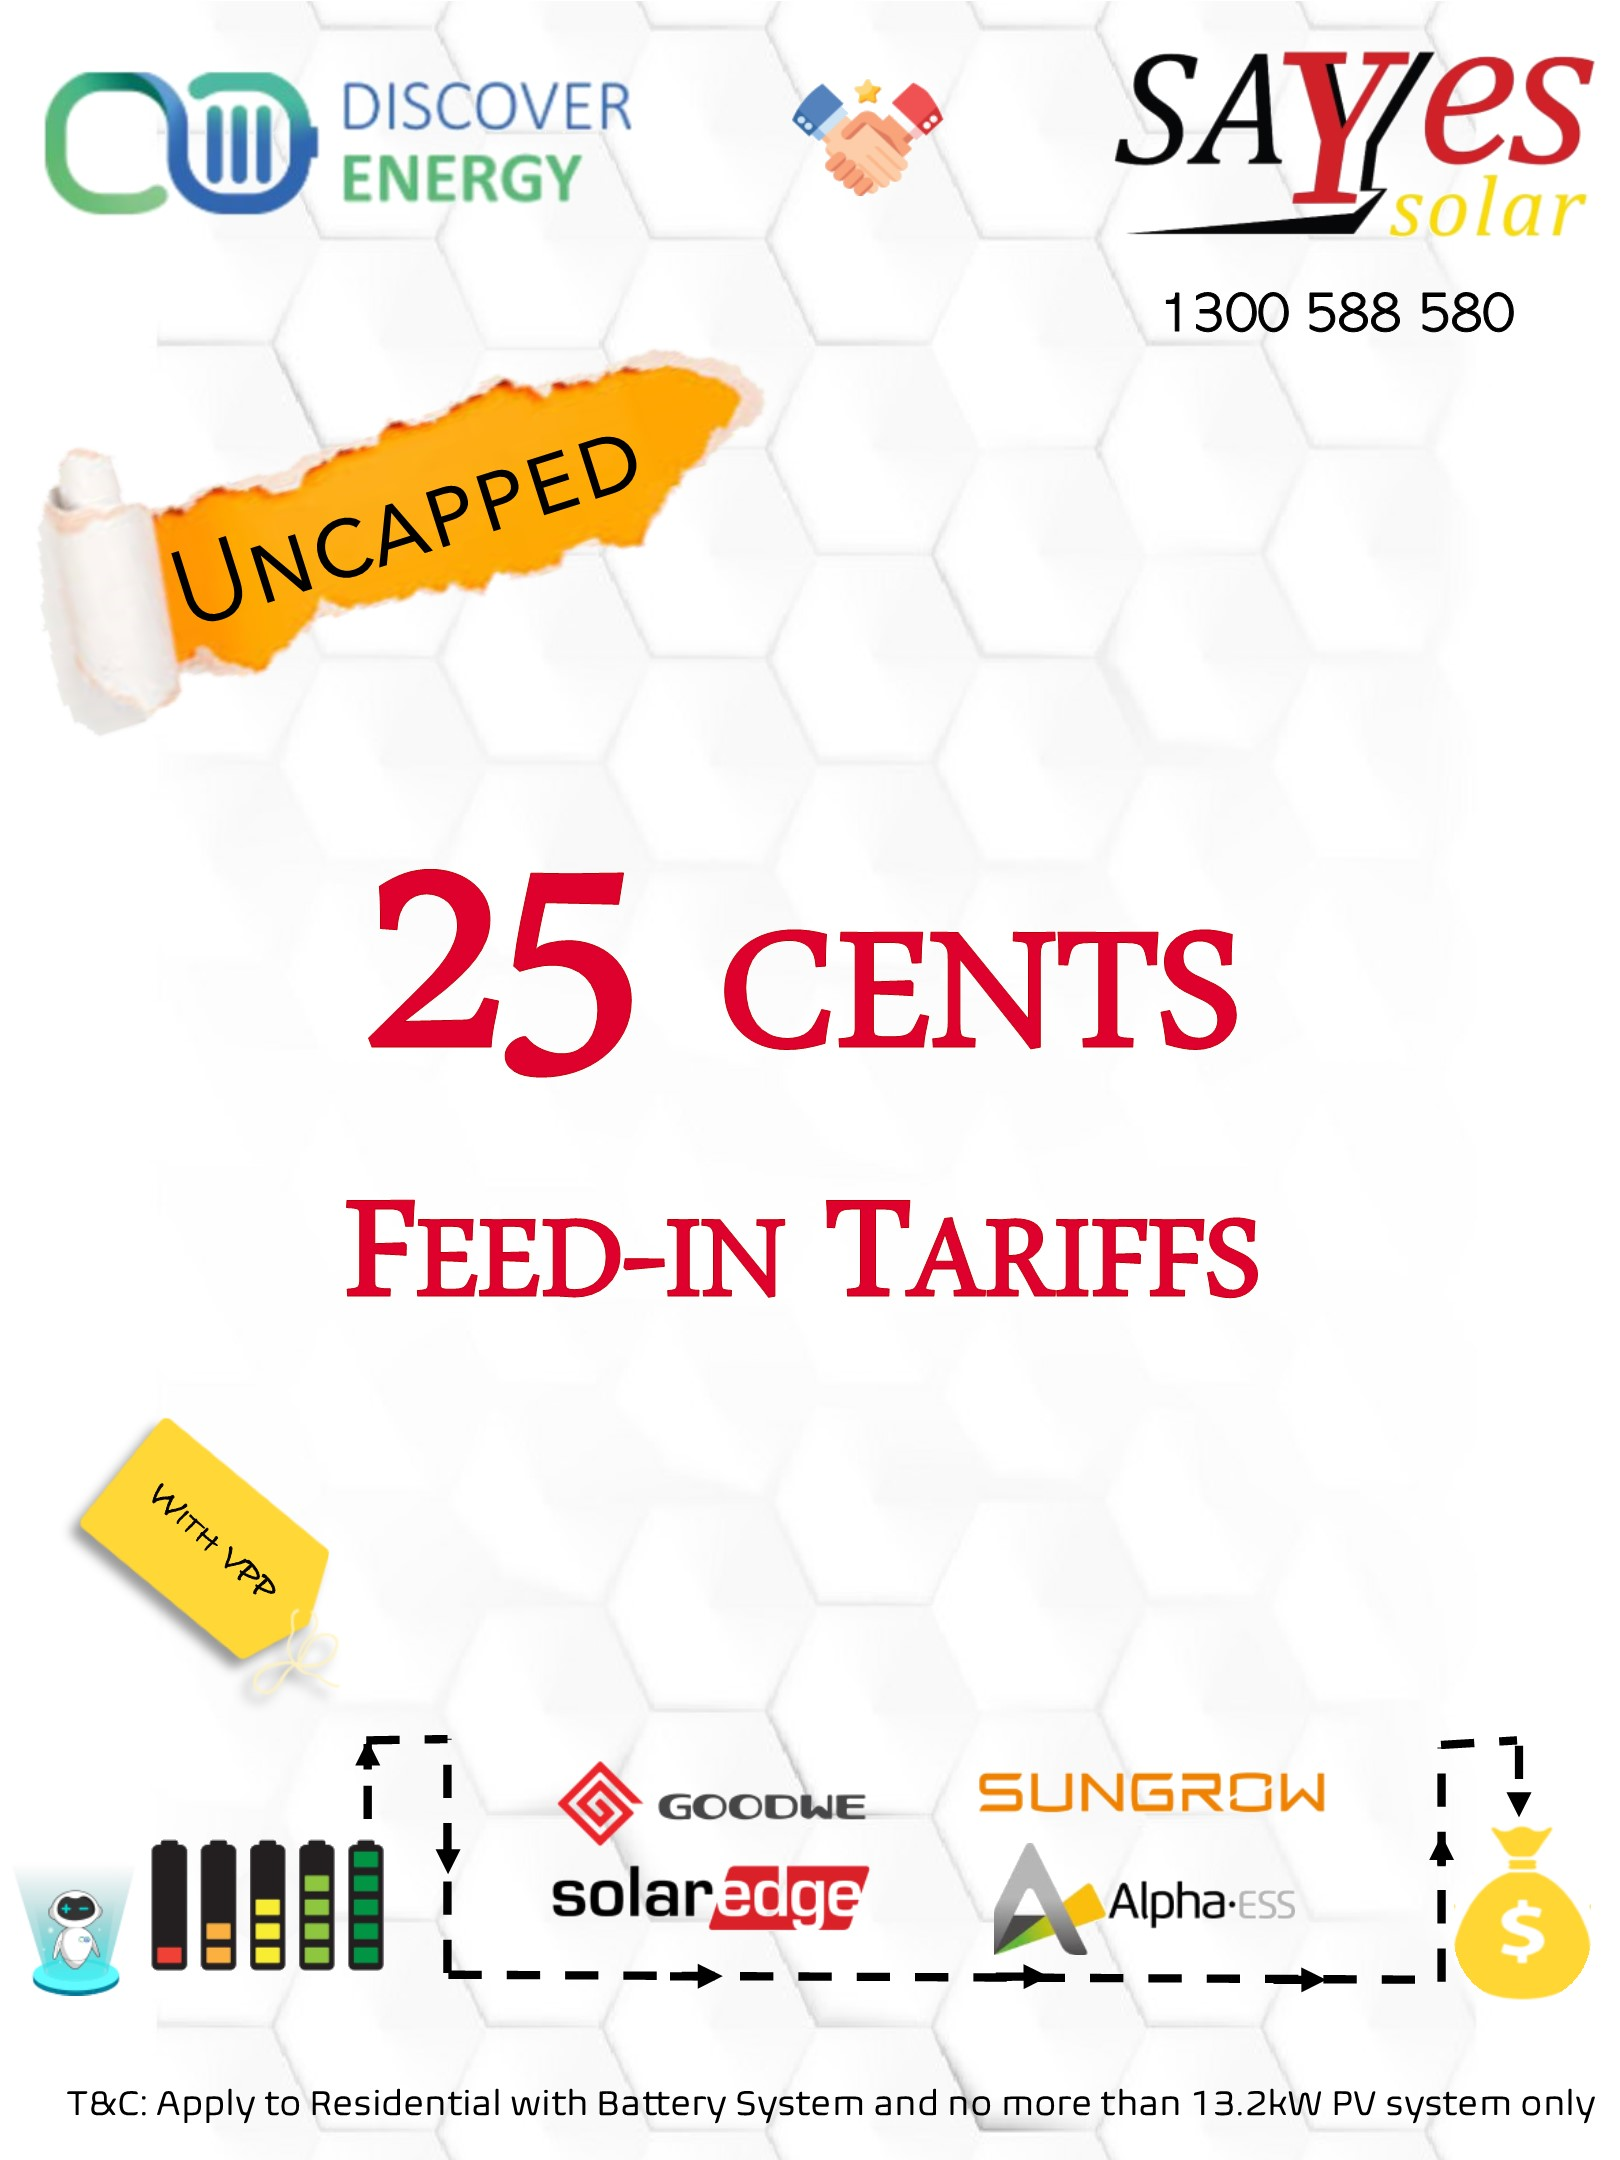 Feed in tariffs, VPP, virtual power plant